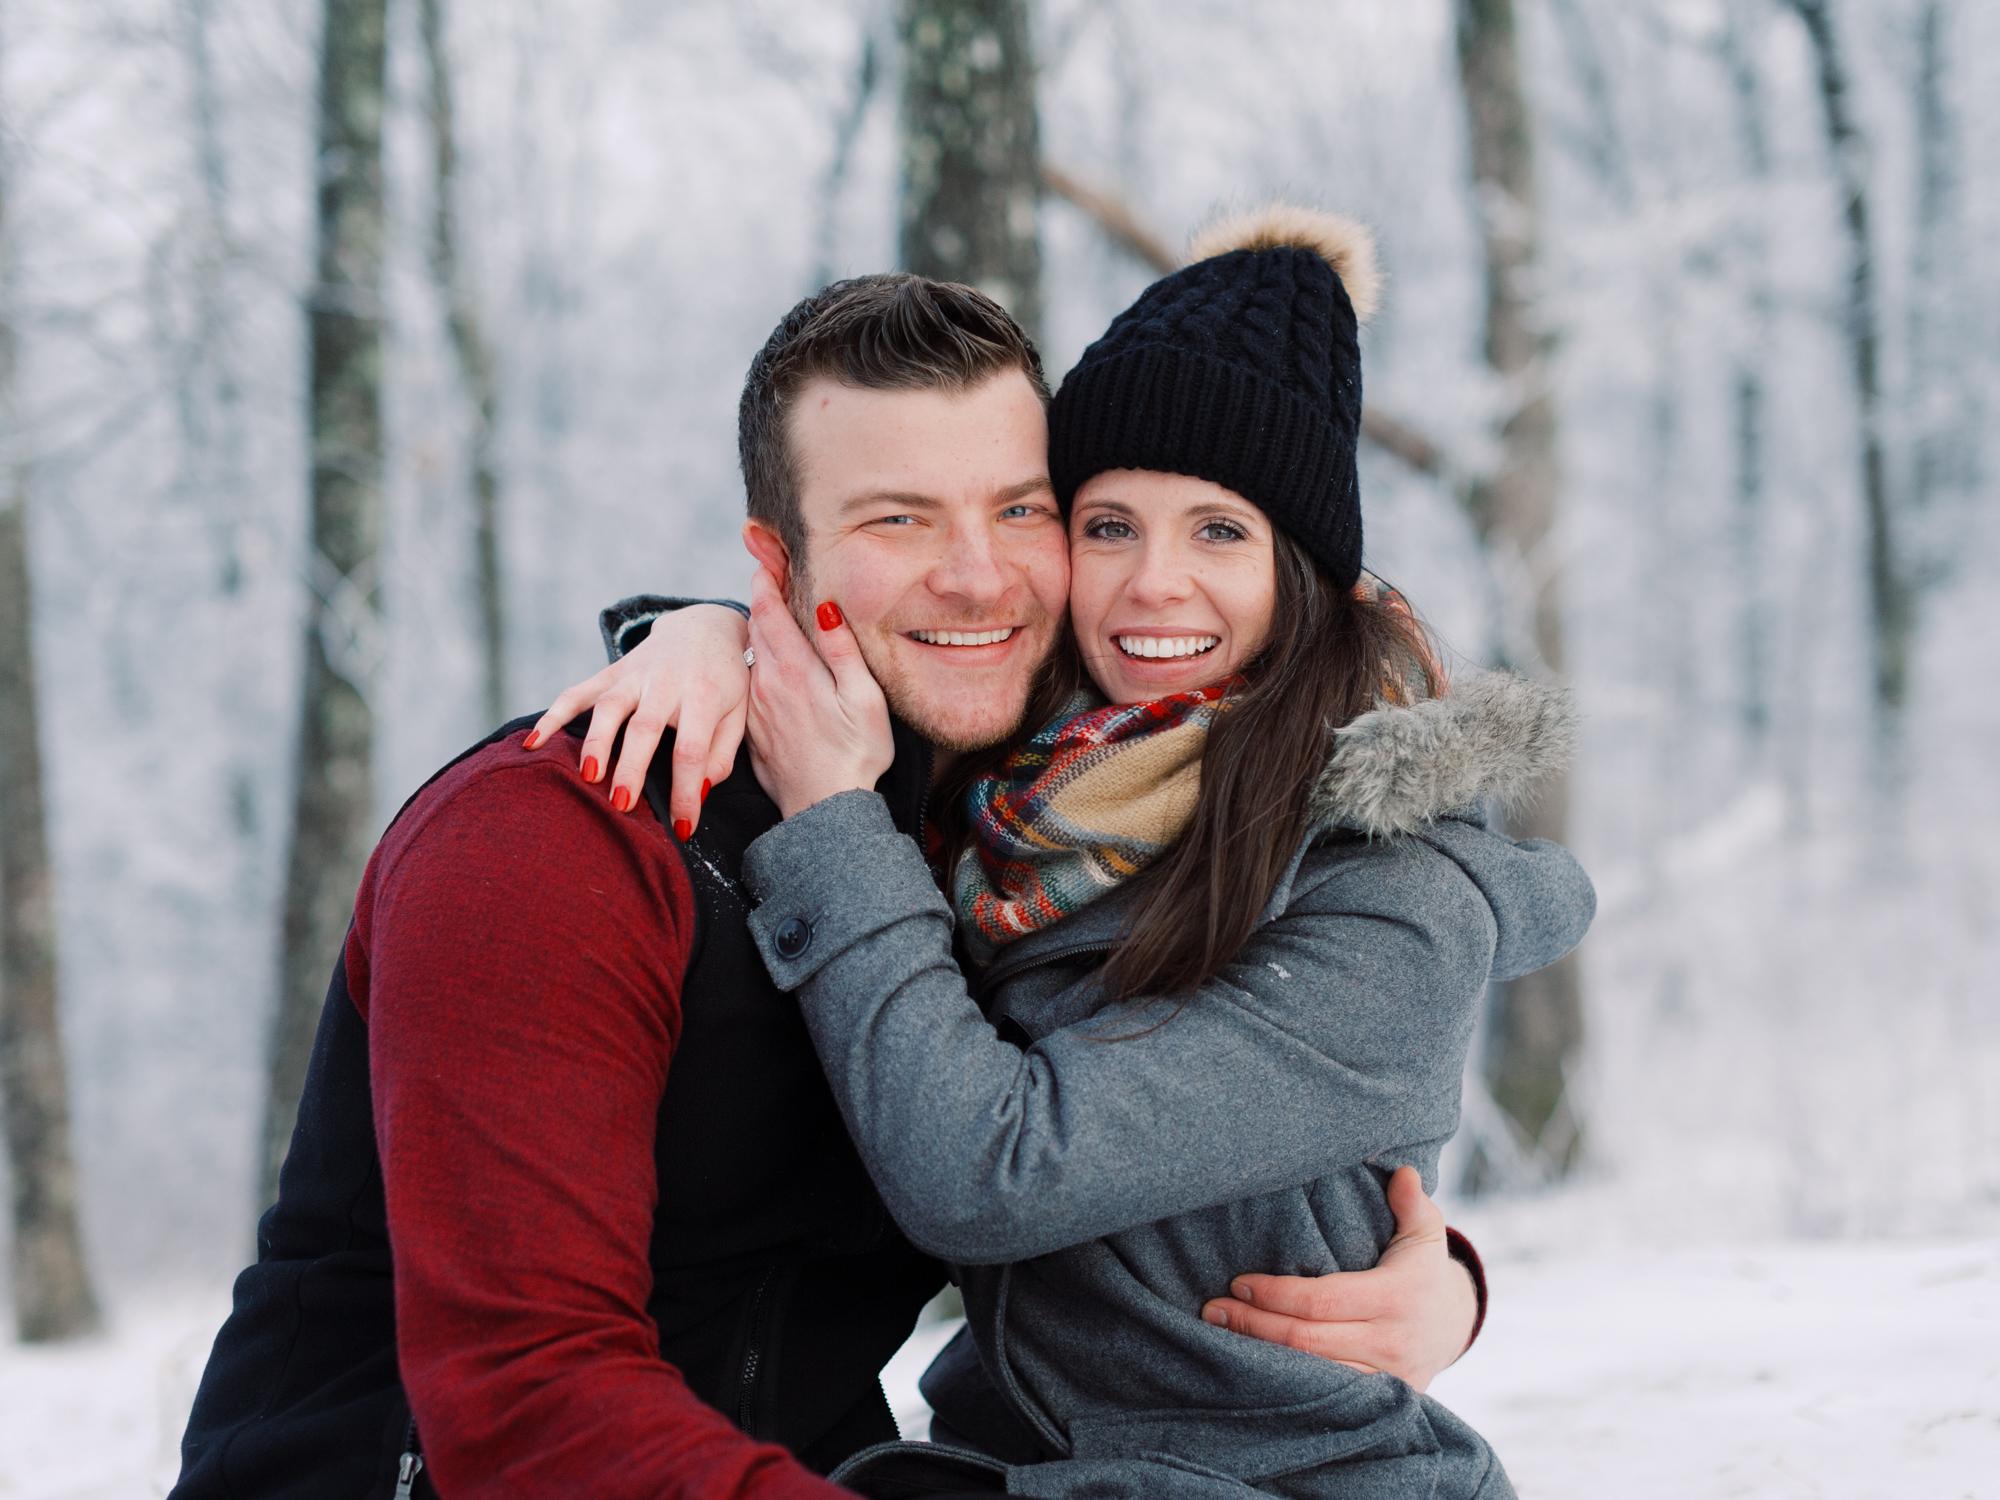 snowy-georgia-proposal-preachers-rock-atlanta-dahlonega-wedding-photographer-hannah-forsberg-fine-art-film-32.jpg